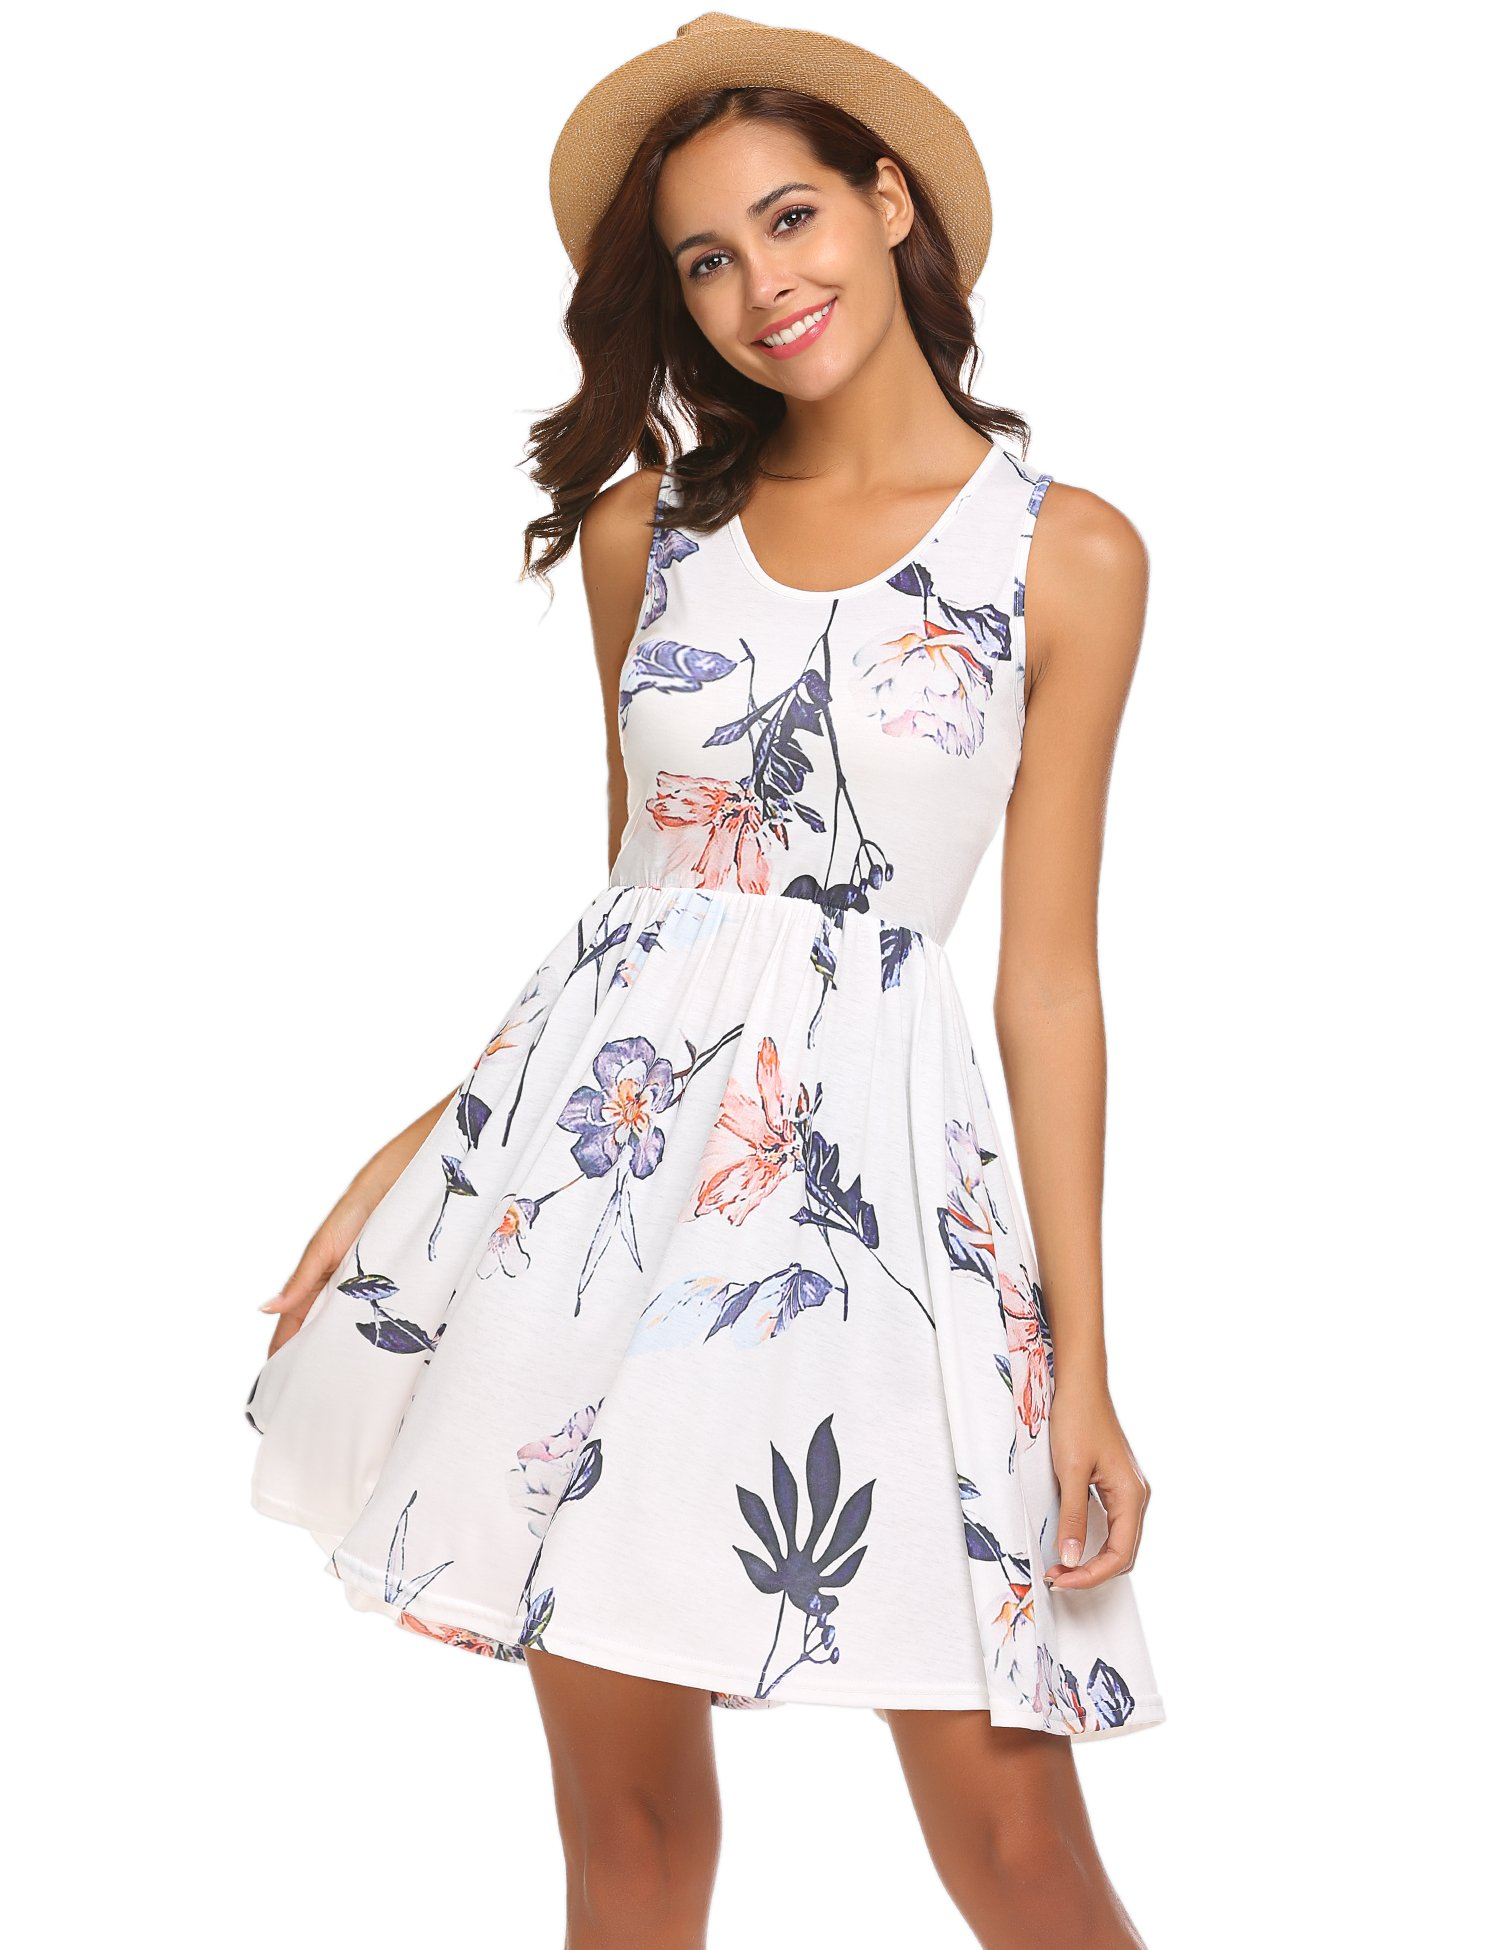 POGTMM Women's Summer Floral Printed Sleeveless Mini Dress (00White, S)